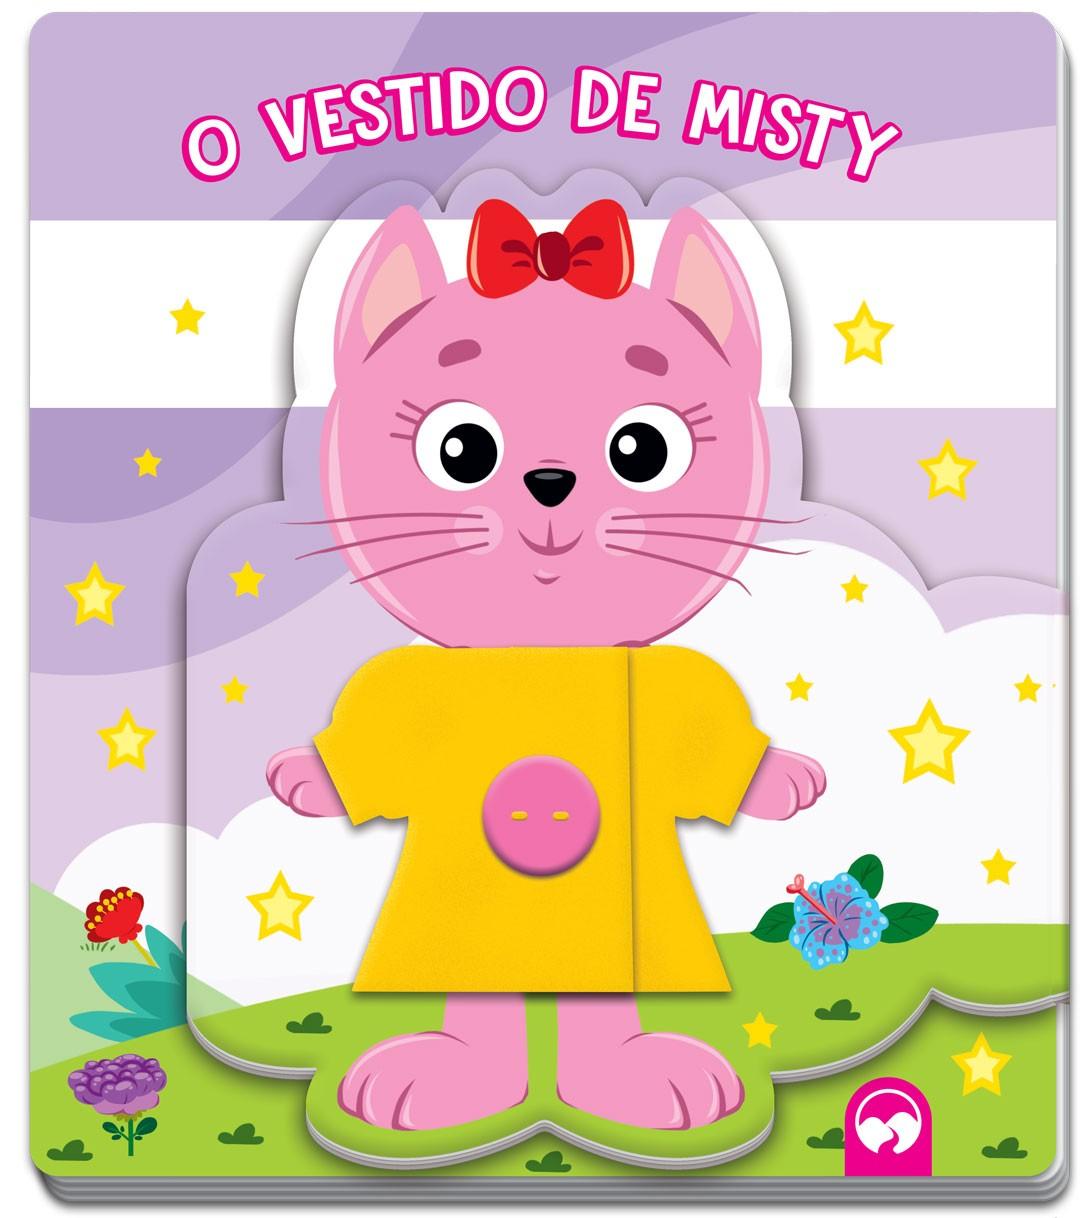 O Vestido de Misty - Vamos Aprender